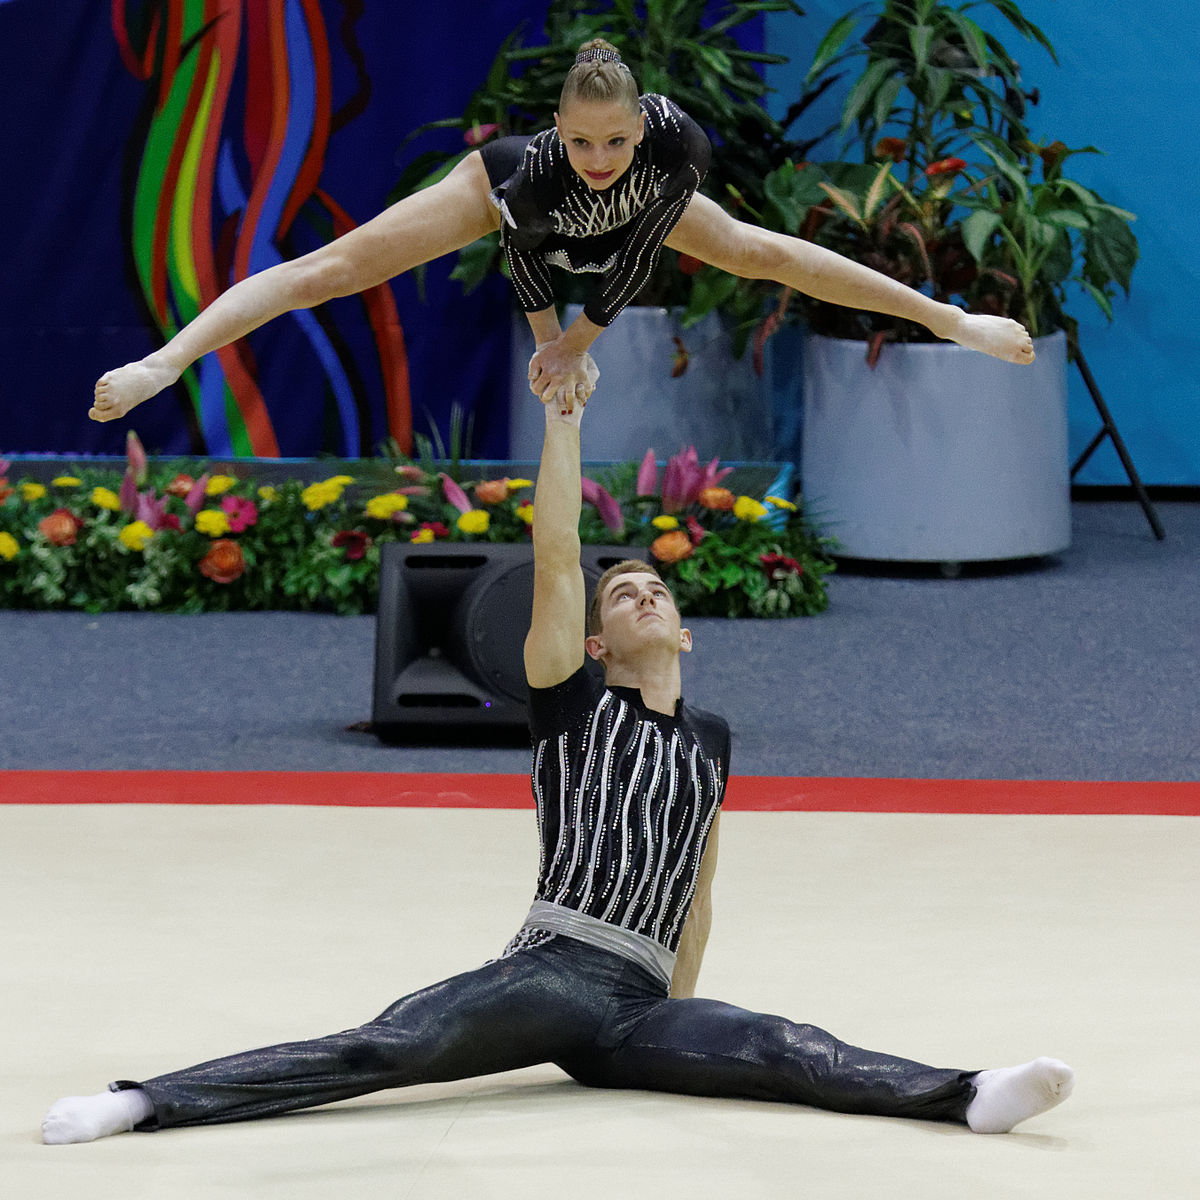 Camille Curti - Wikipedia Acrobatic Gymnastics Mixed Pair